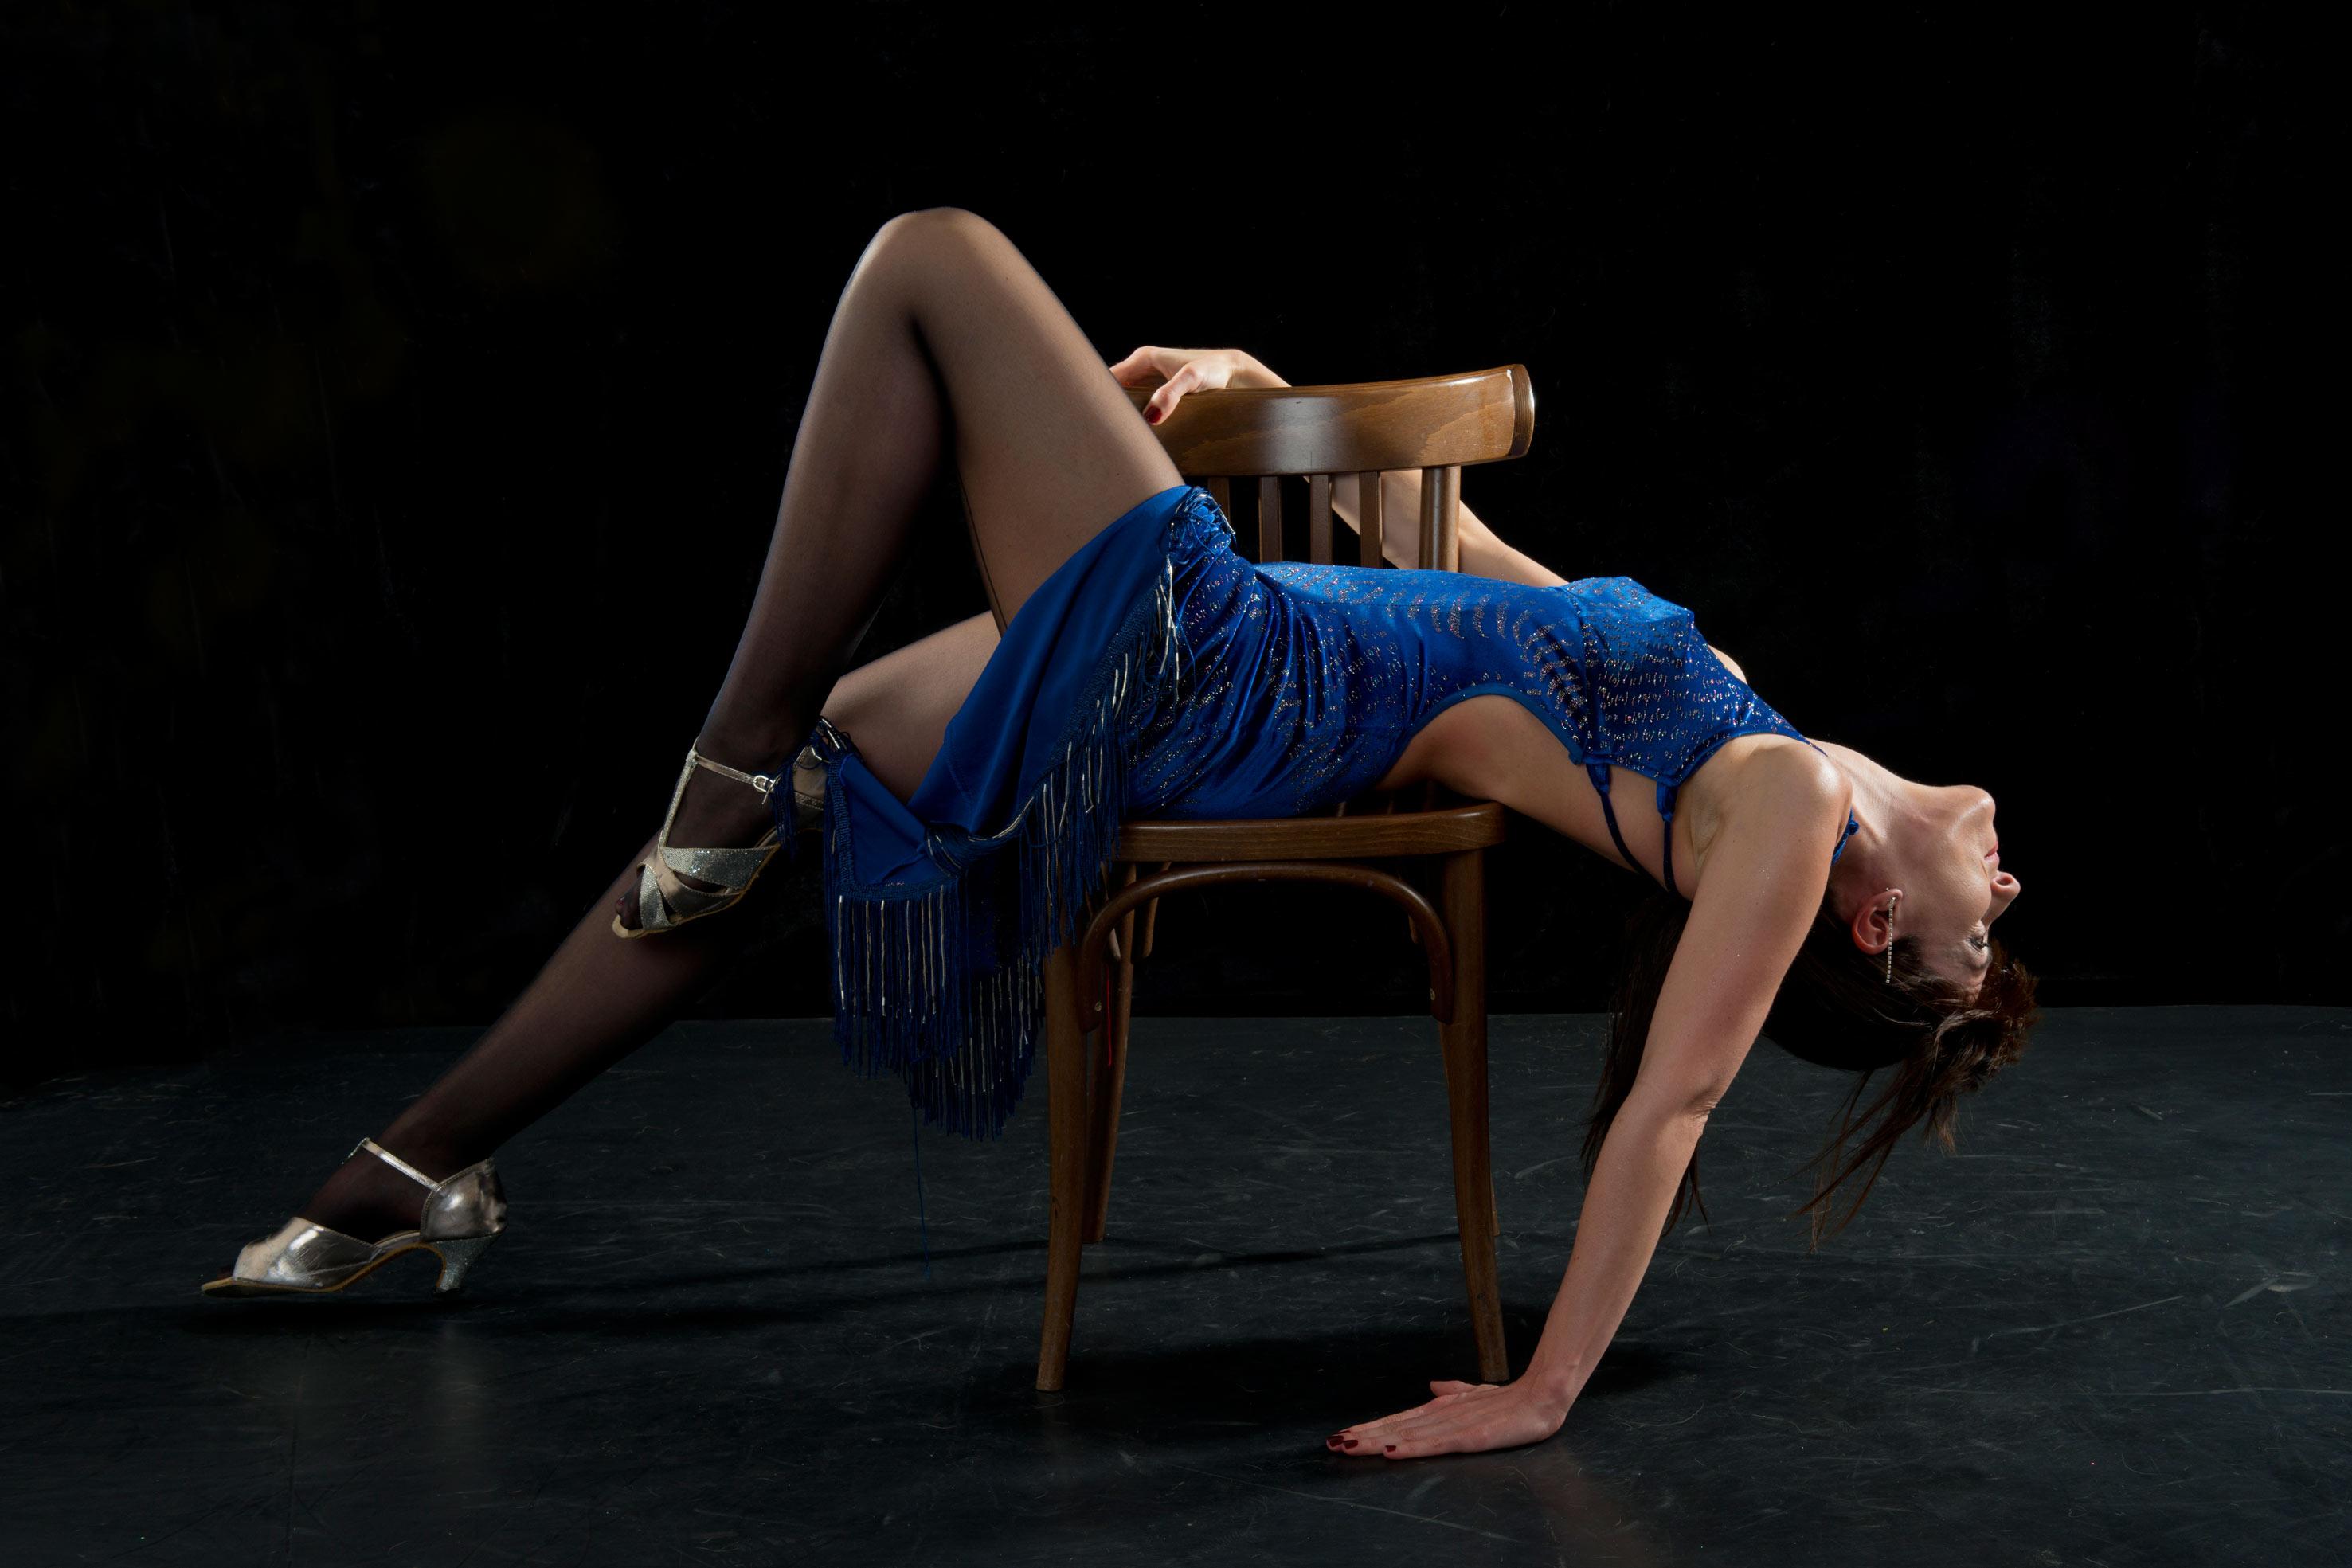 Clases de baile en Madrid-Profesores de baile Madrid-Clases particulares de baile-Juan Brenes-Laura Holt-juanbrenesdancer